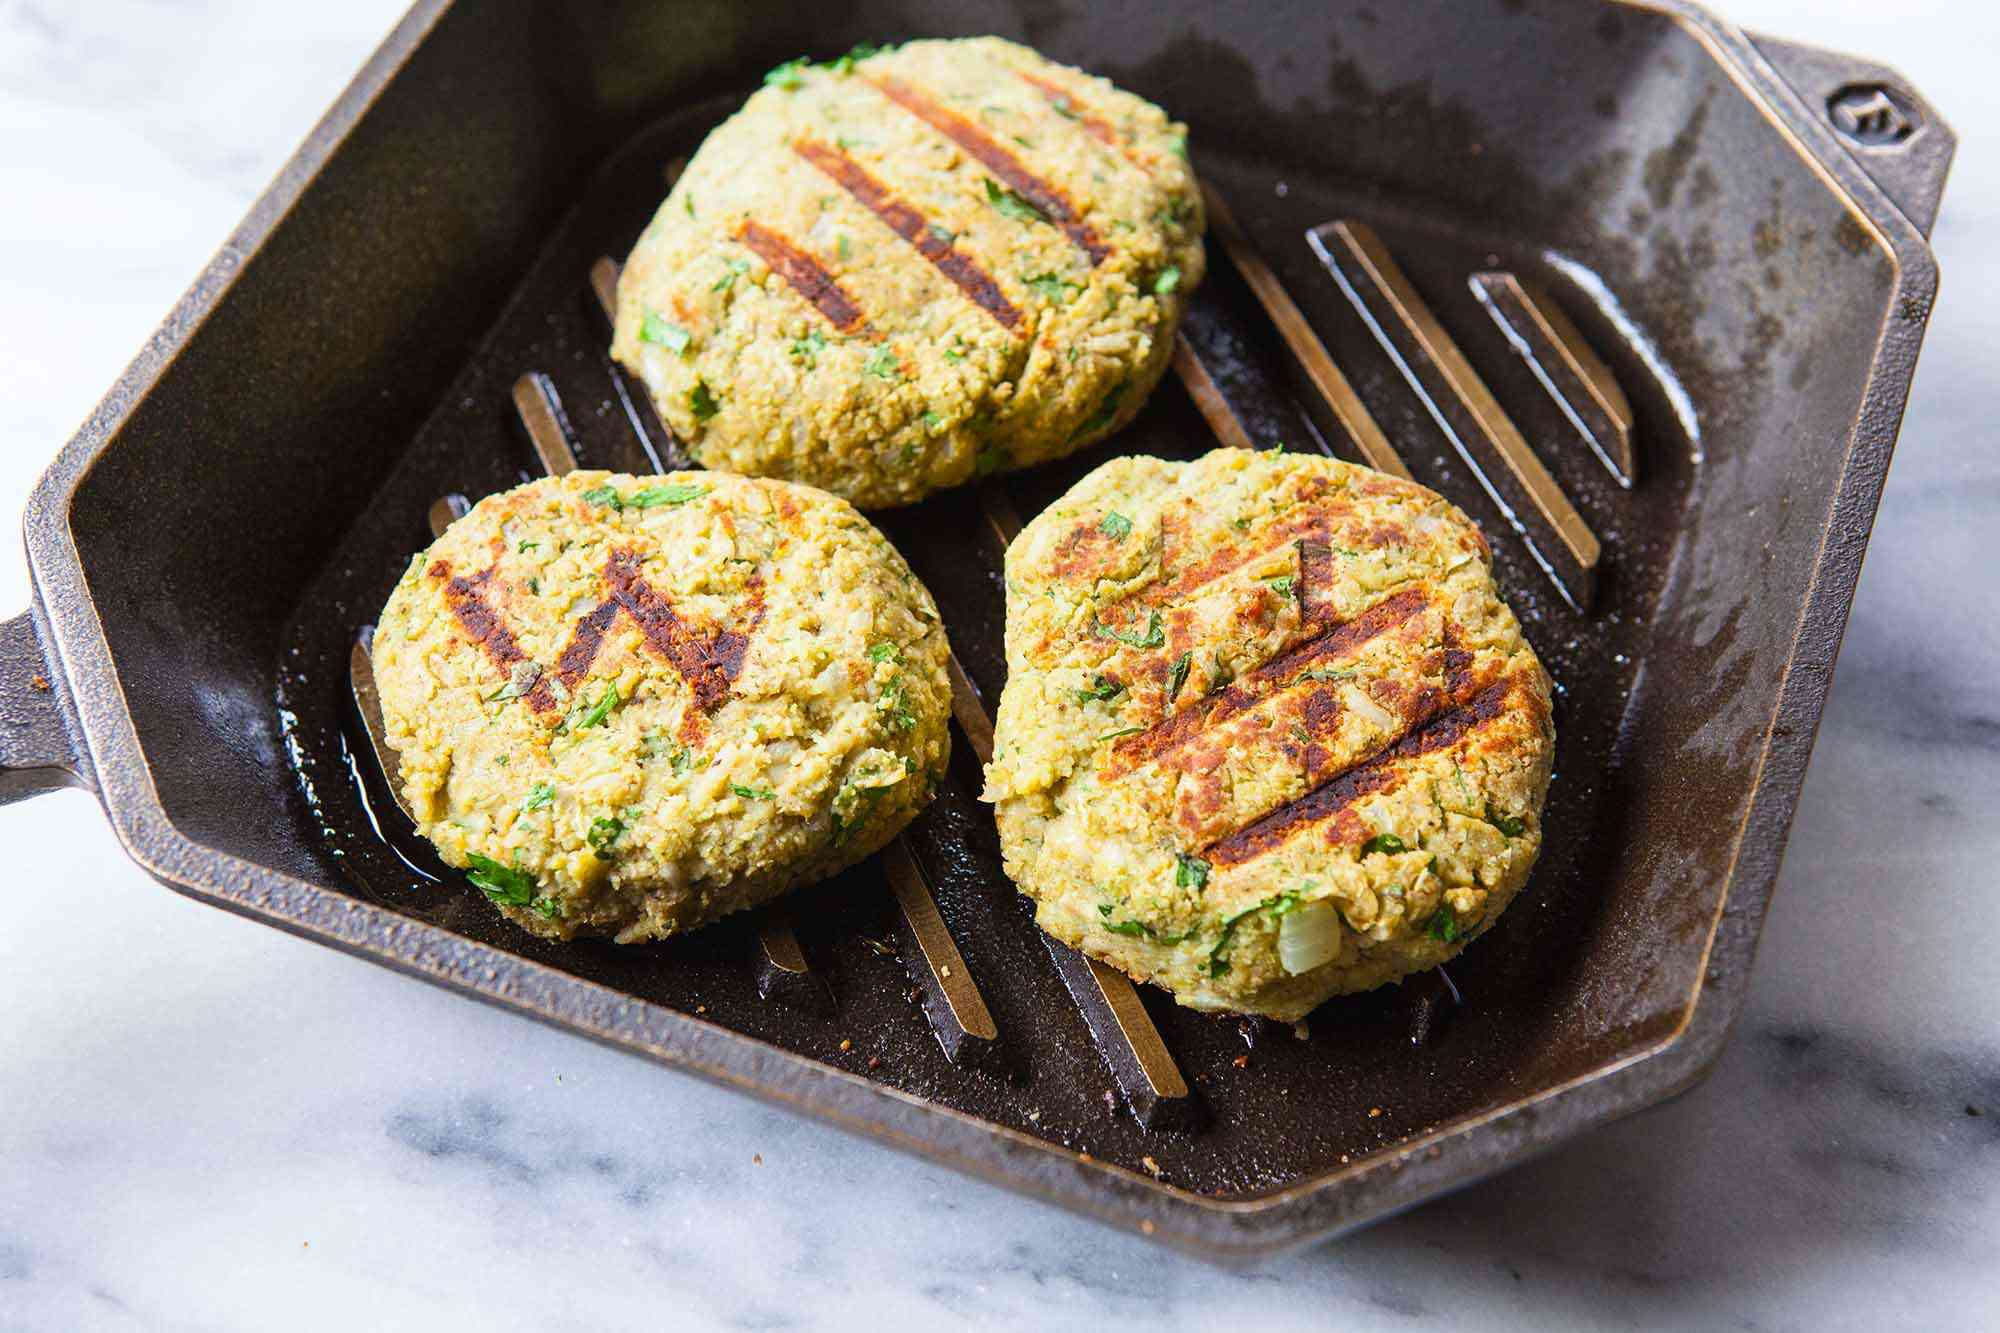 Stovetop Veggie Burger Recipe cook the burgers